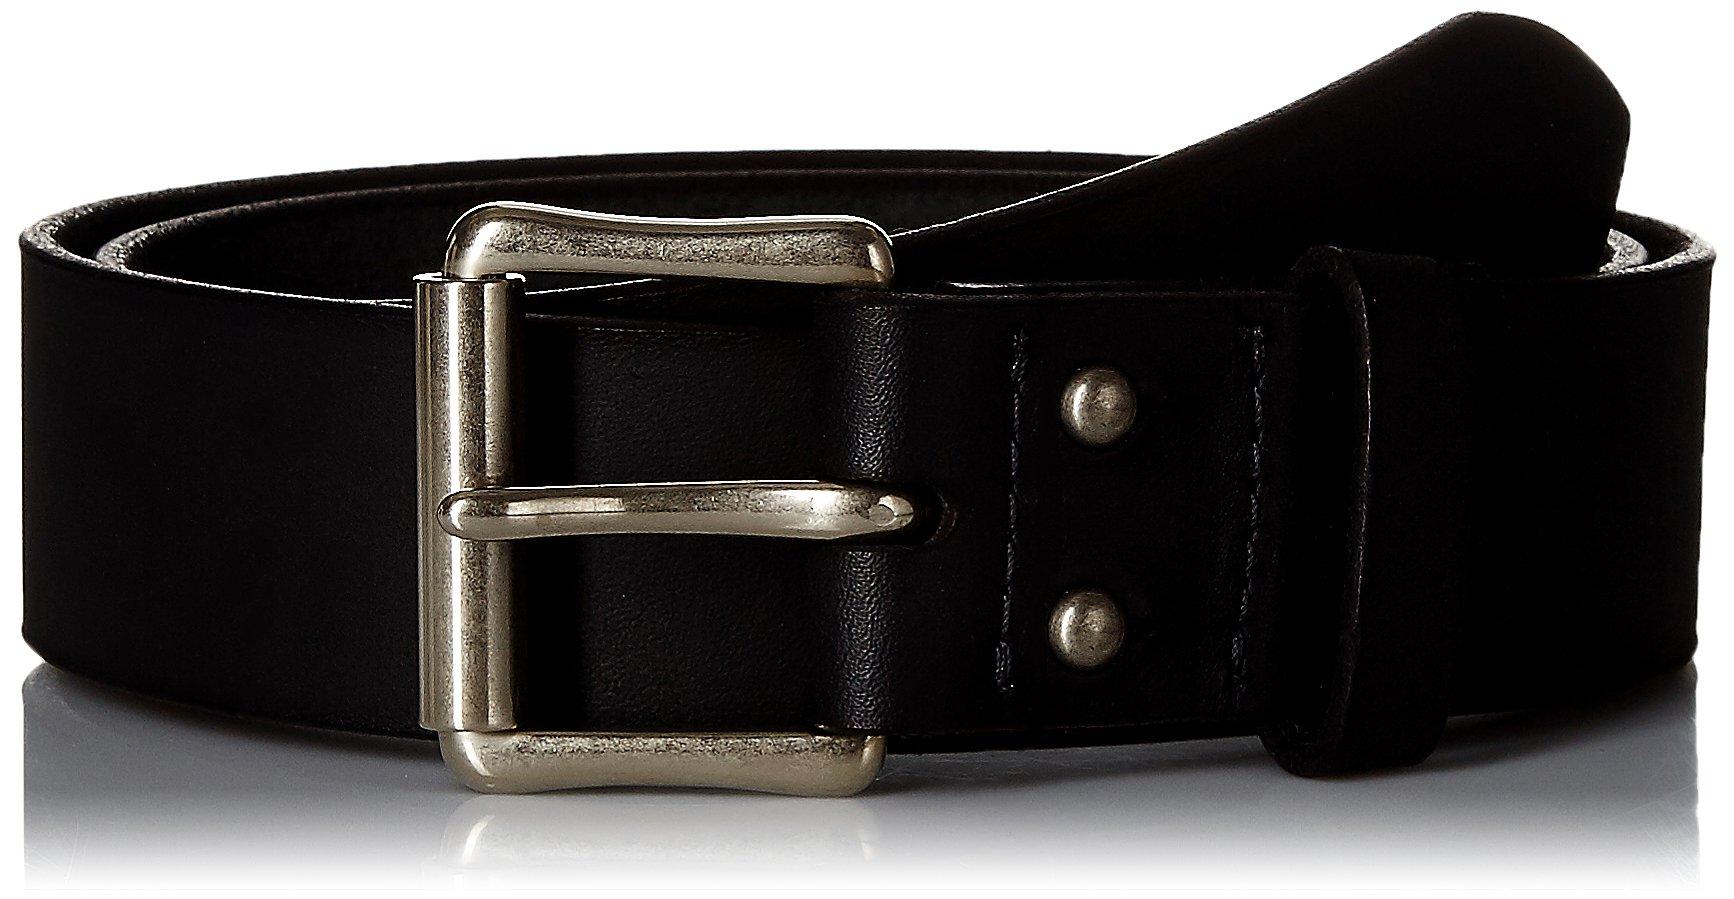 Red Wing Heritage Leather Belt, Black, 38